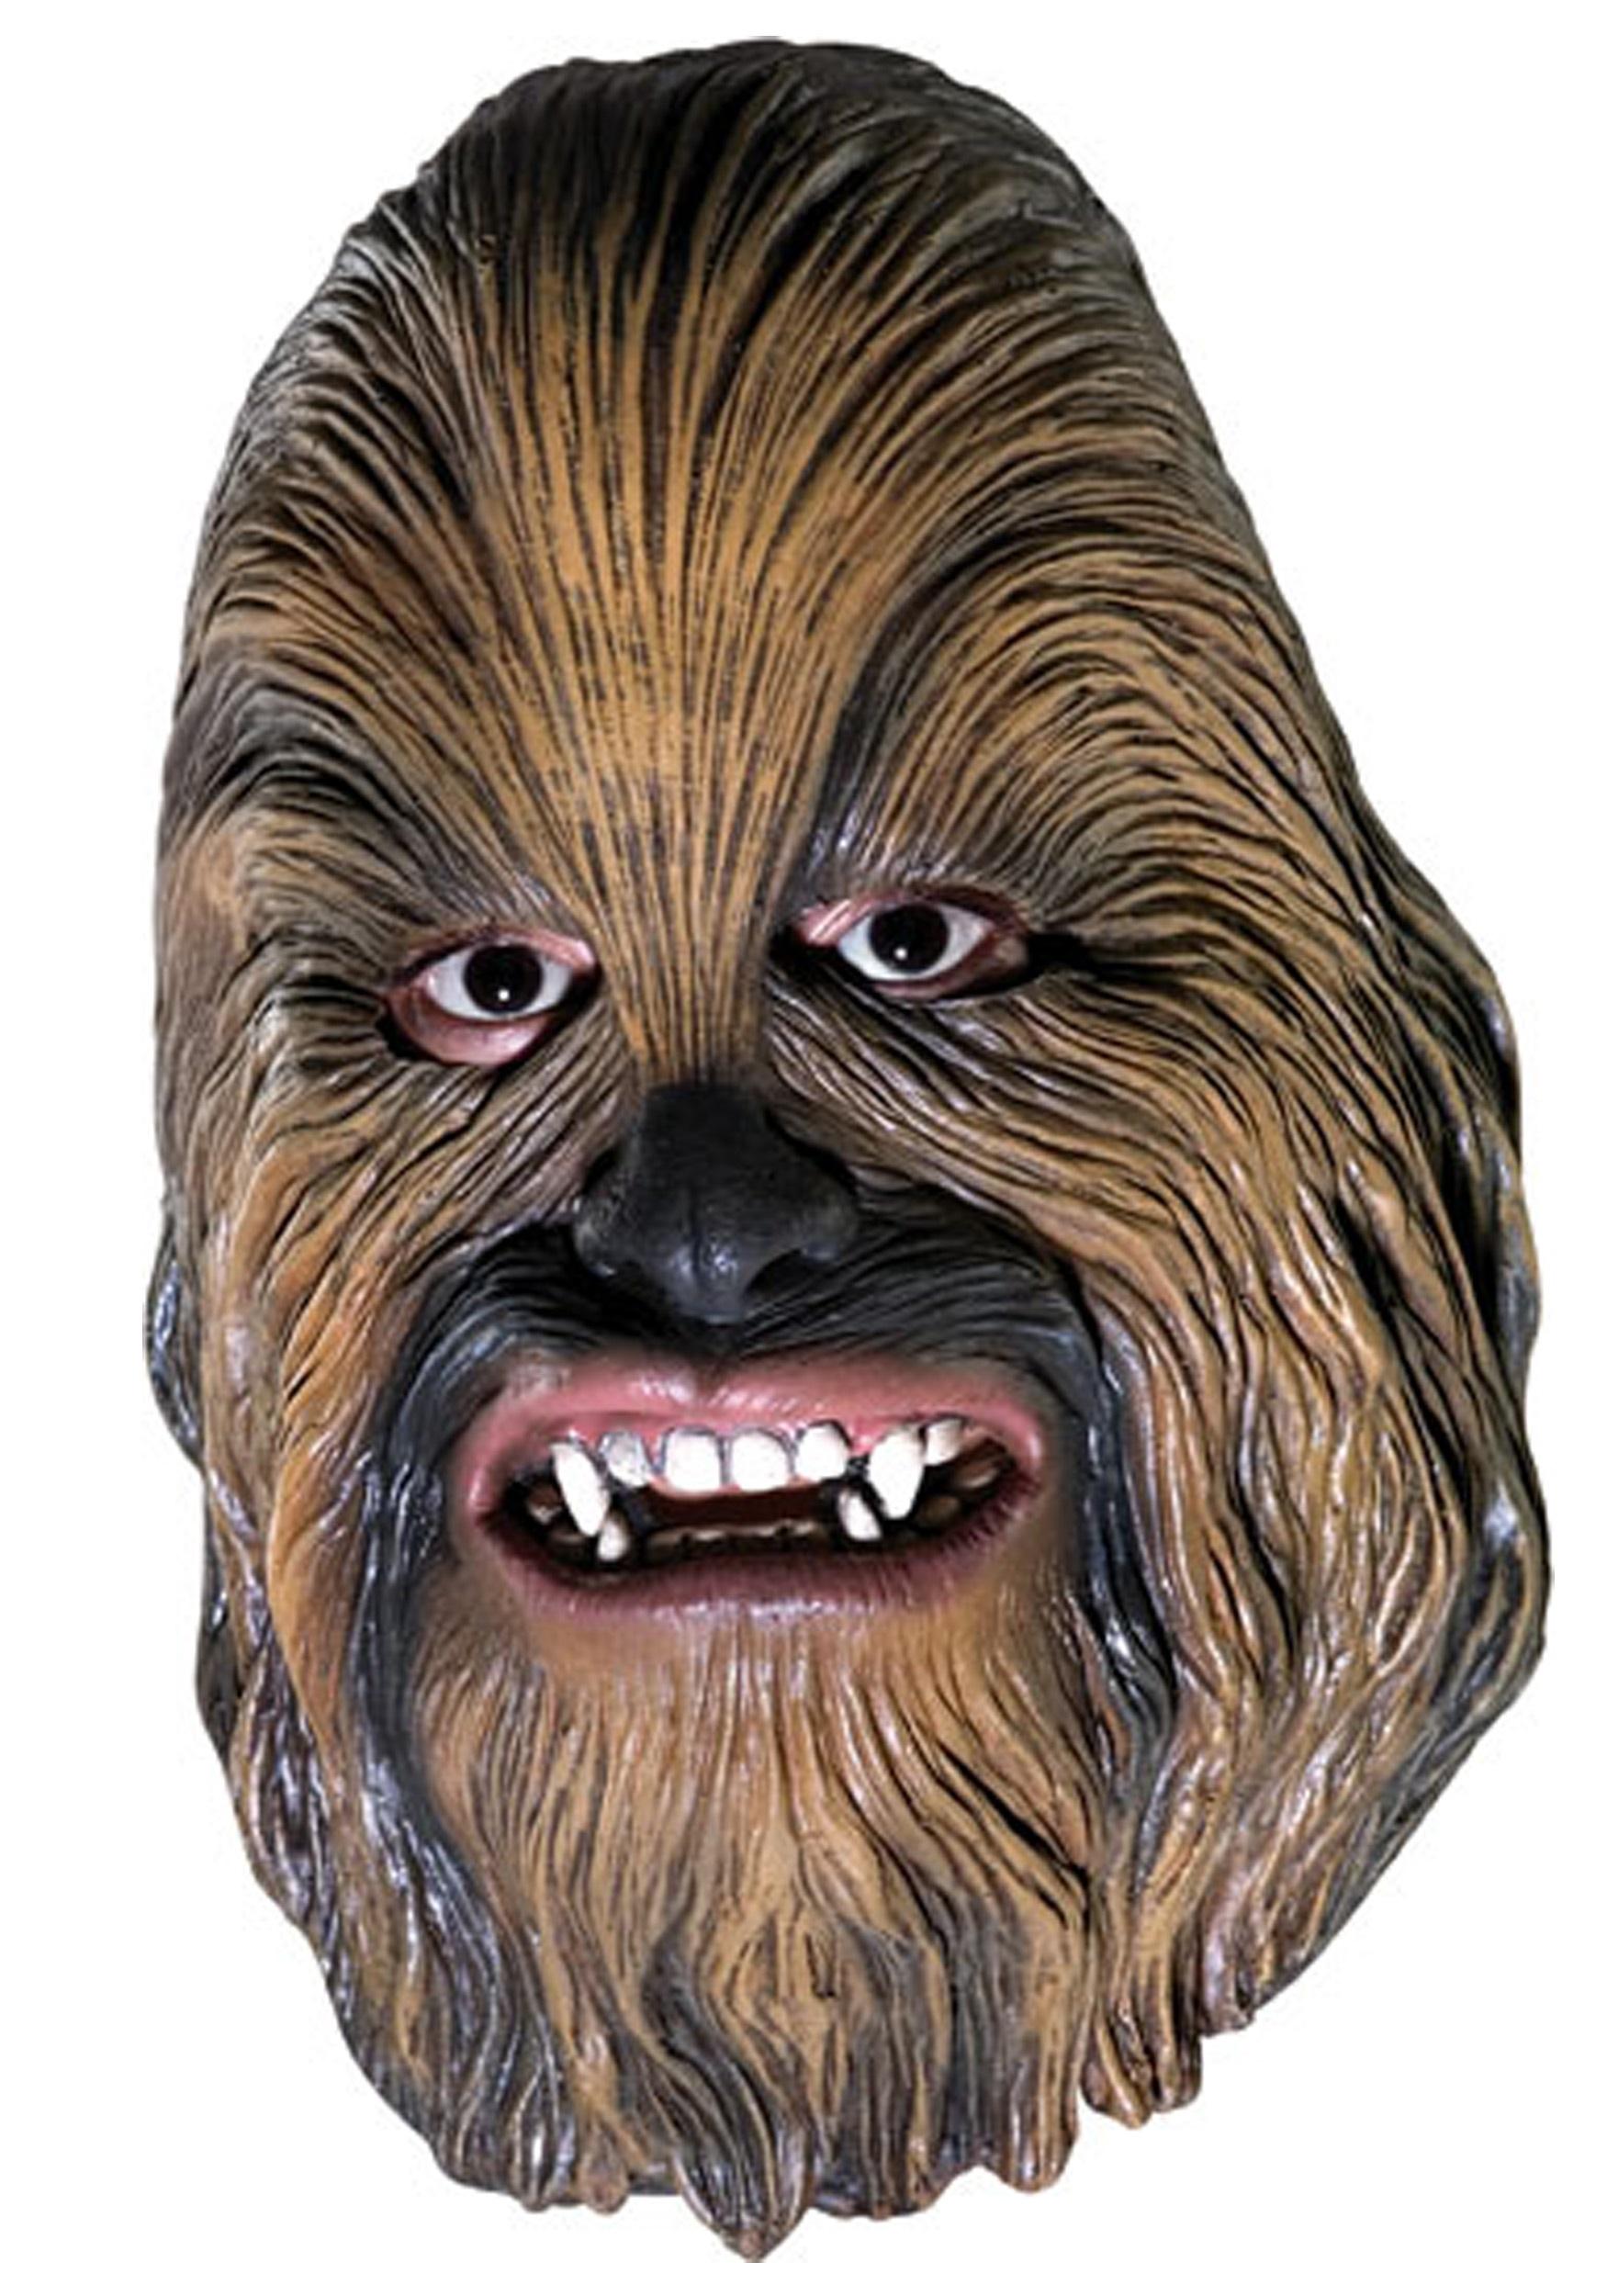 Chewbacca Costumes - Adult, Child, Baby Star Wars Halloween ...